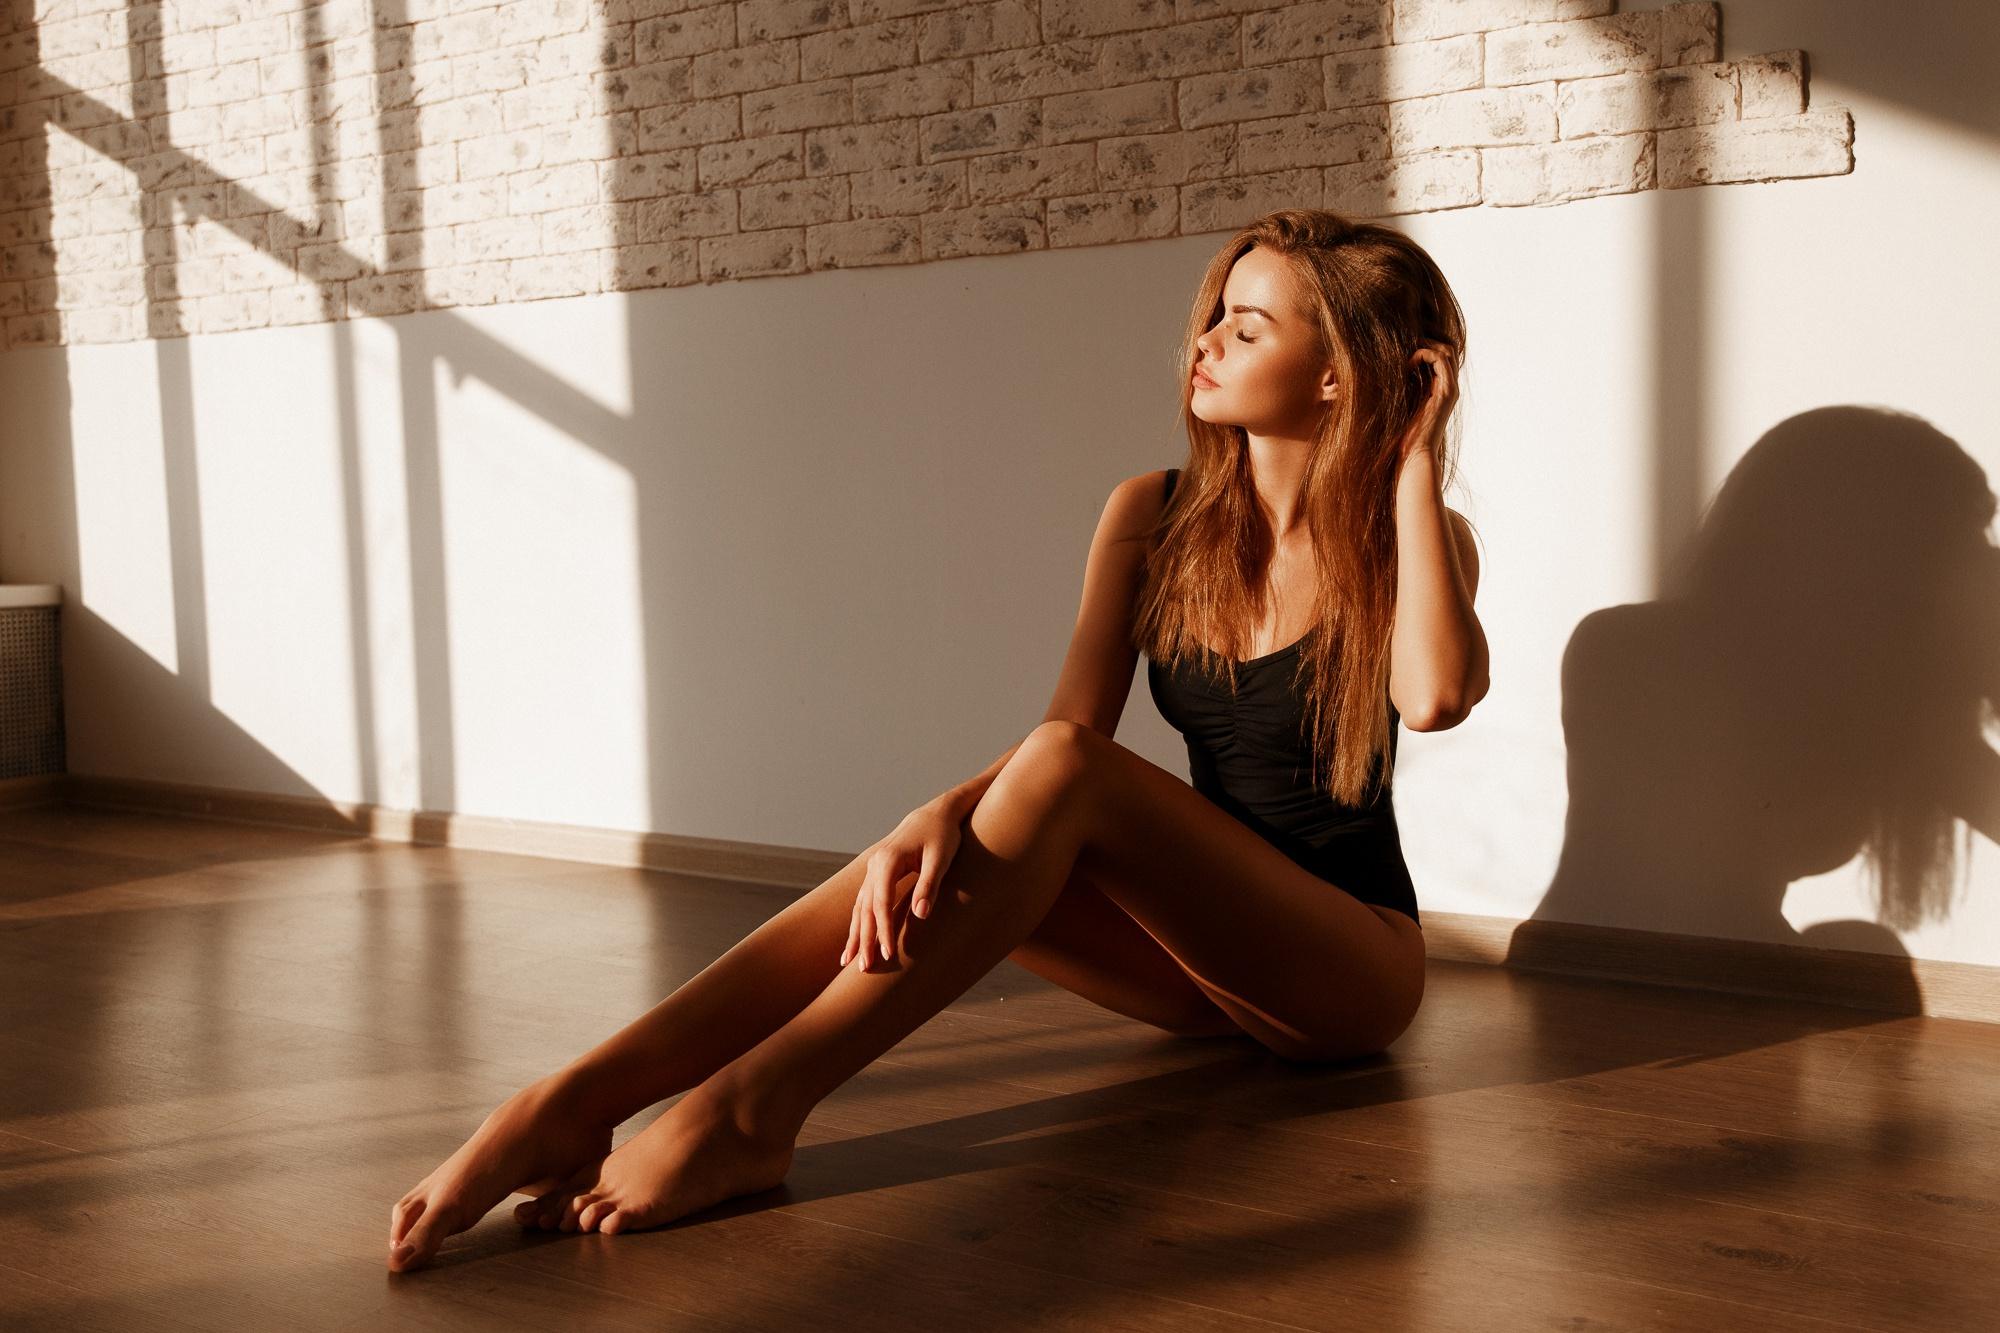 Девушка сидящая на полу картинка